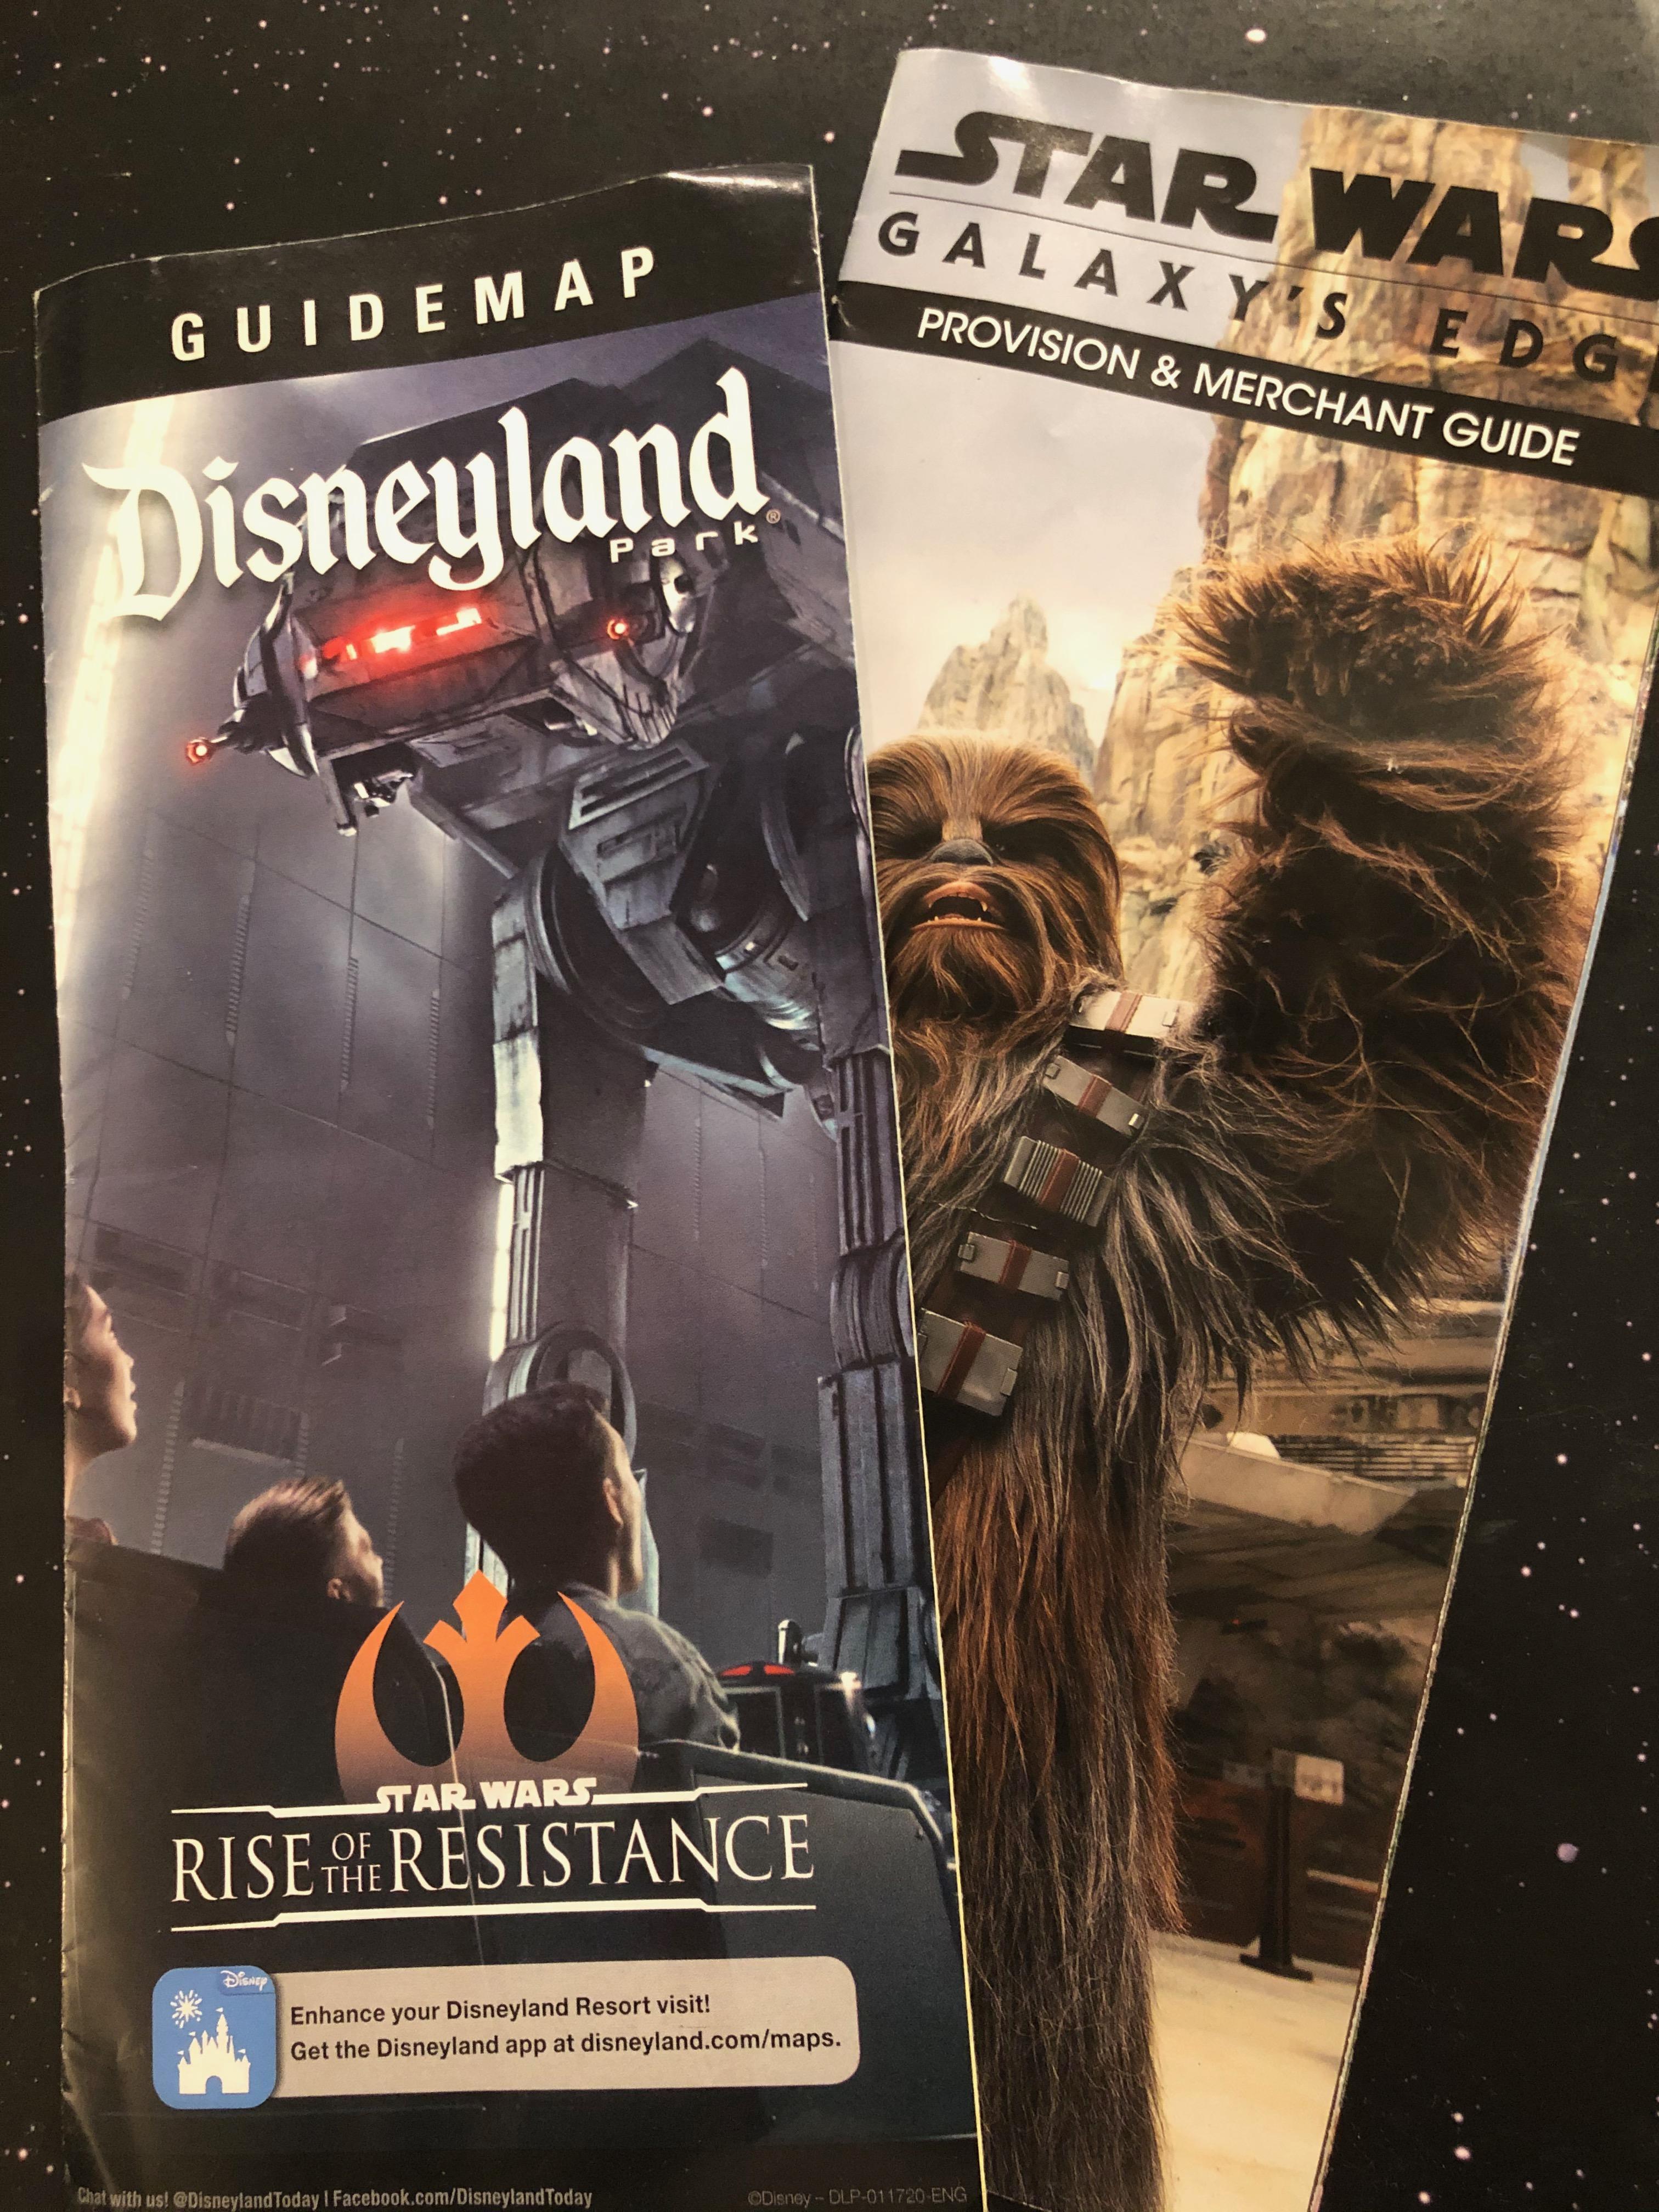 Park GuideMap Disneyland Star Wars Black Series Galaxy/'s Edge DROID DEPOT